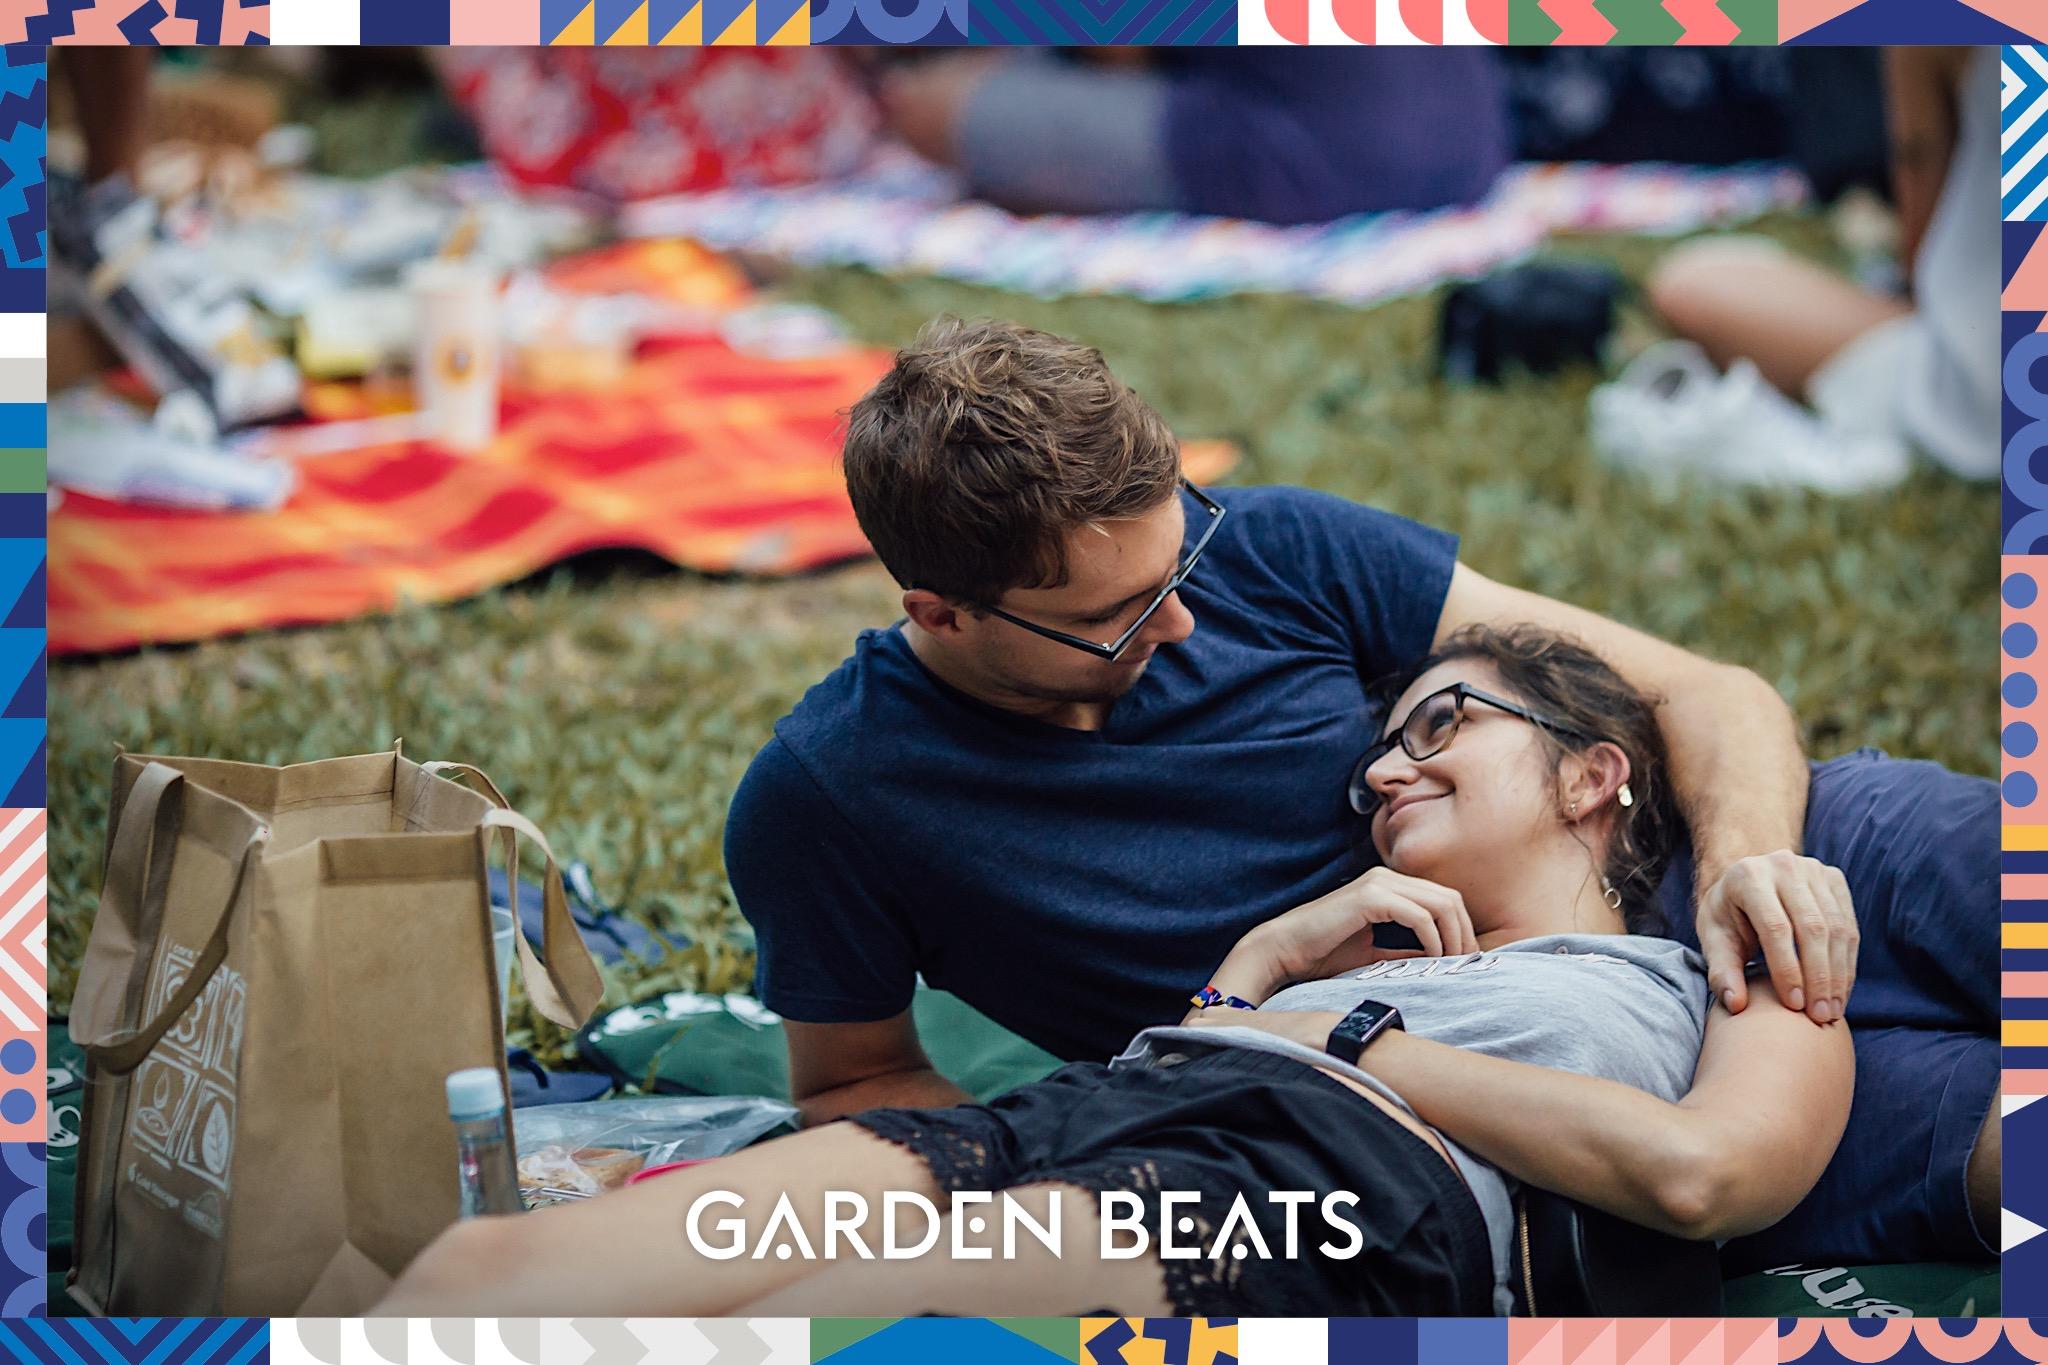 18032017_GardenBeats_Colossal694_WatermarkedGB.jpg